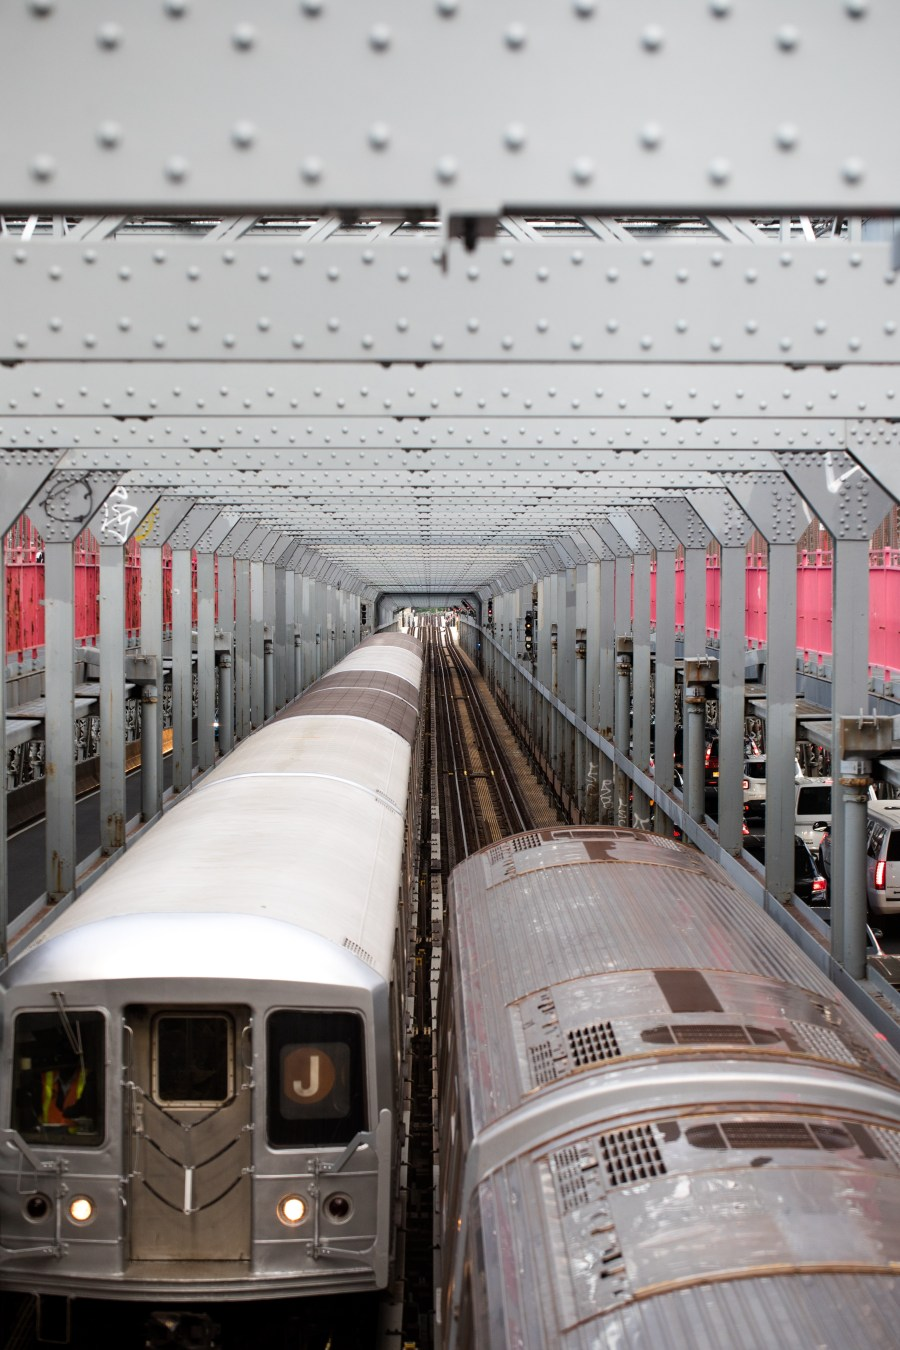 Passing trains on bridge, The Initation